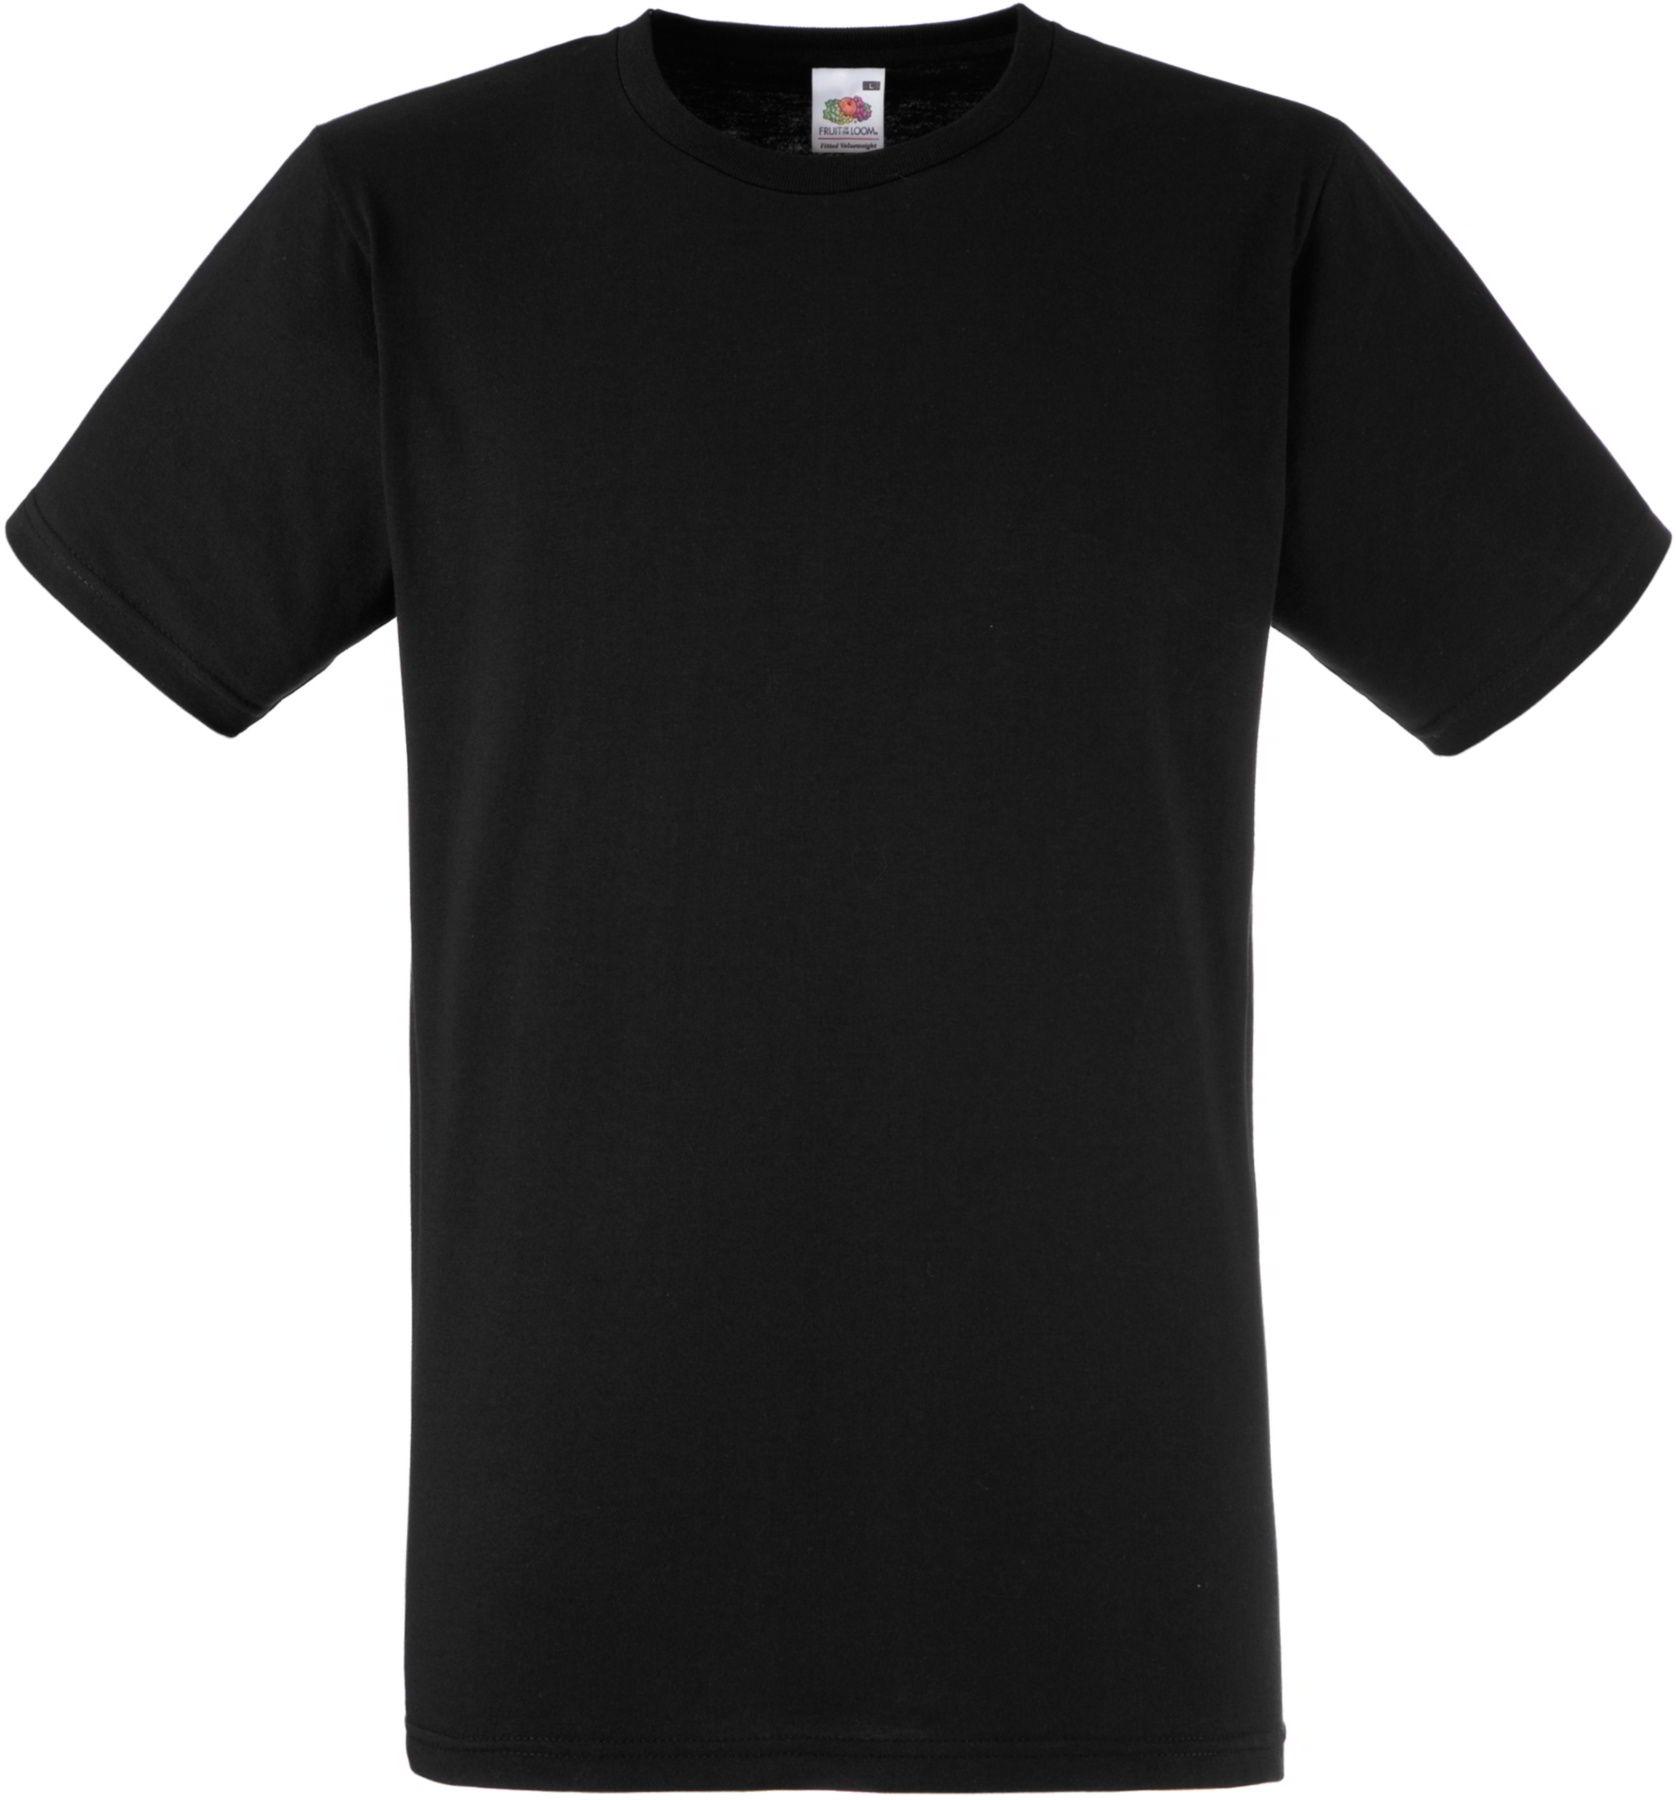 t shirt bedrucken t shirtdruck textildruck shirtdruck fotodruck wunschdruck neu ebay. Black Bedroom Furniture Sets. Home Design Ideas